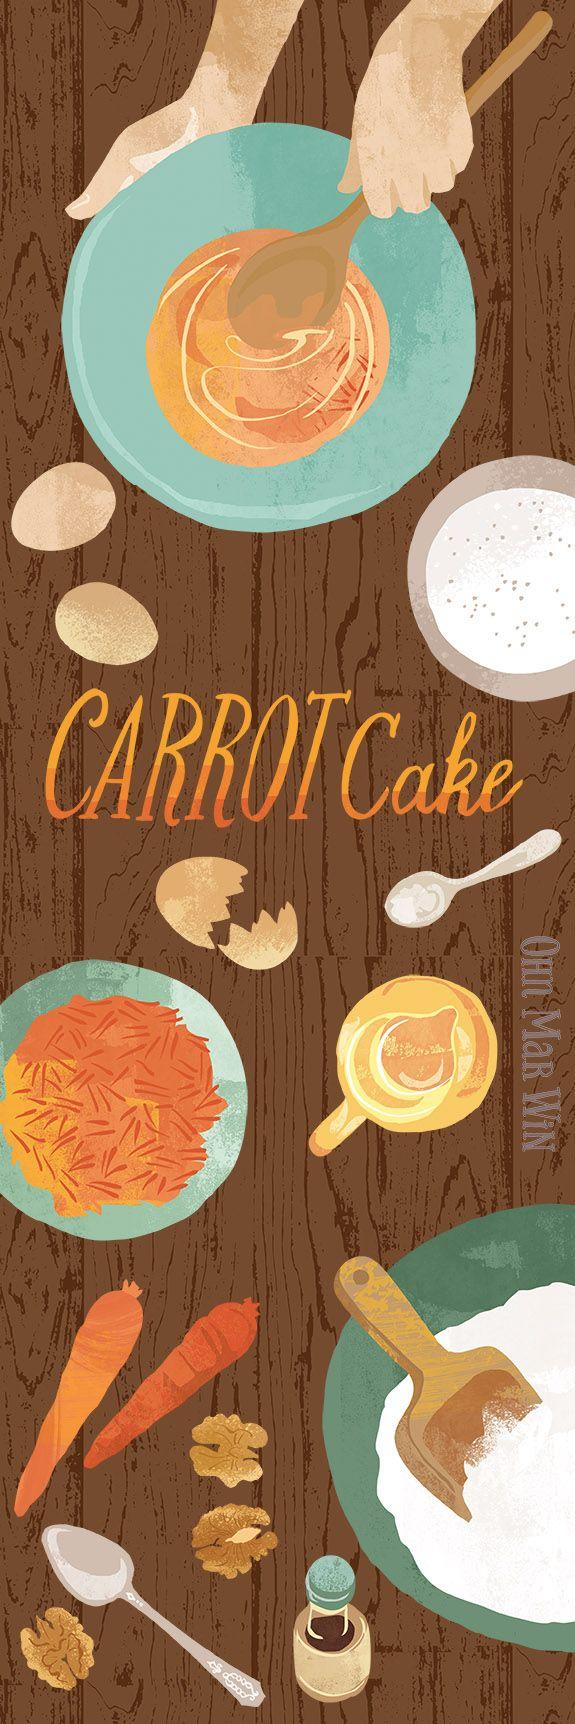 Carrot cake illustration for food magazine Thoorq. Food illustration baking Ohn Mar Win